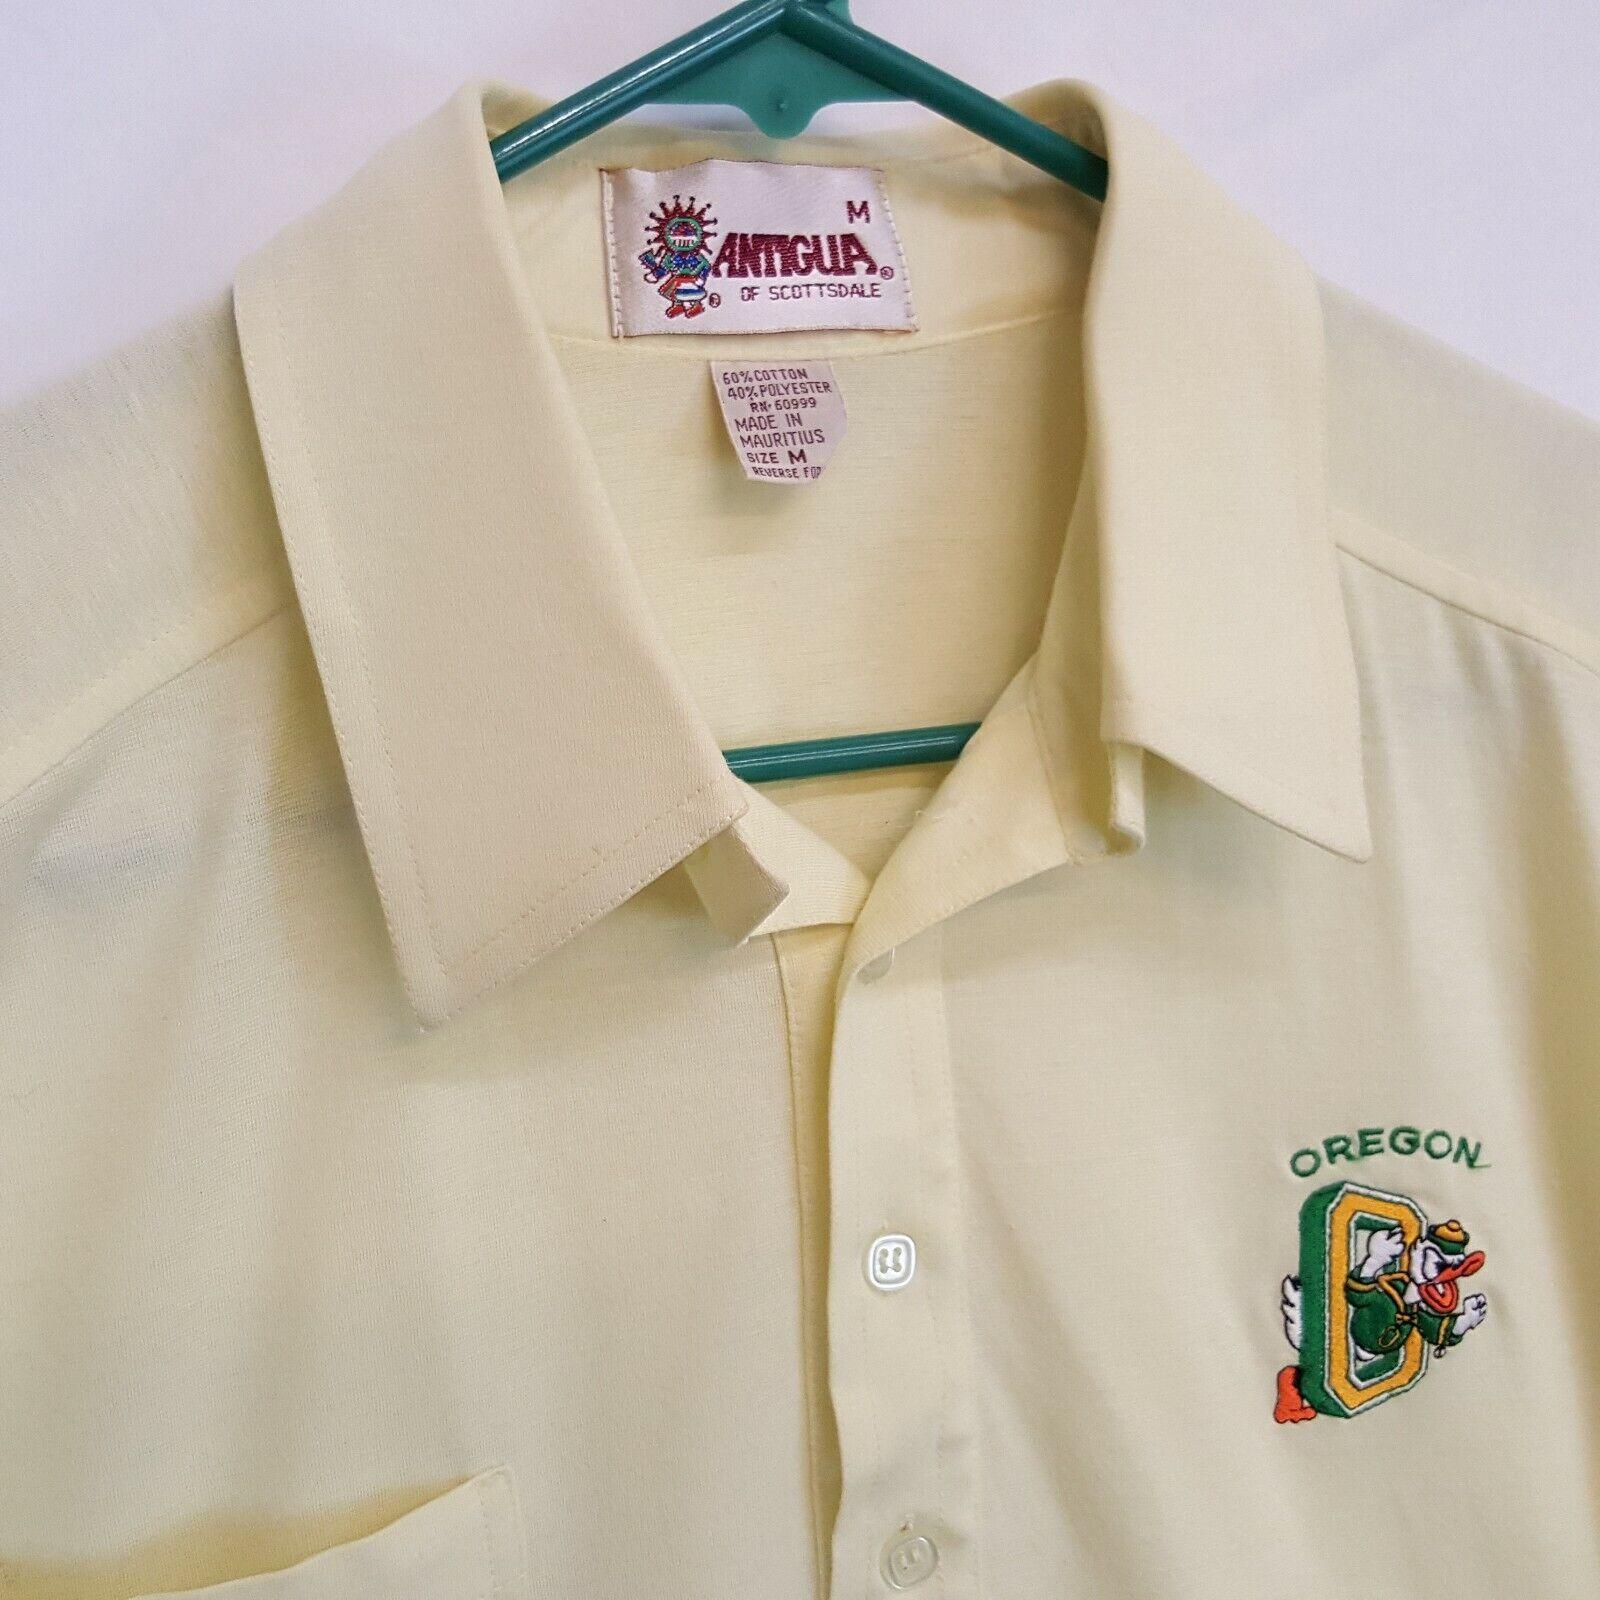 VTG 80s UO Oregon Ducks Antigua Pac 10 Polo Shirt… - image 3